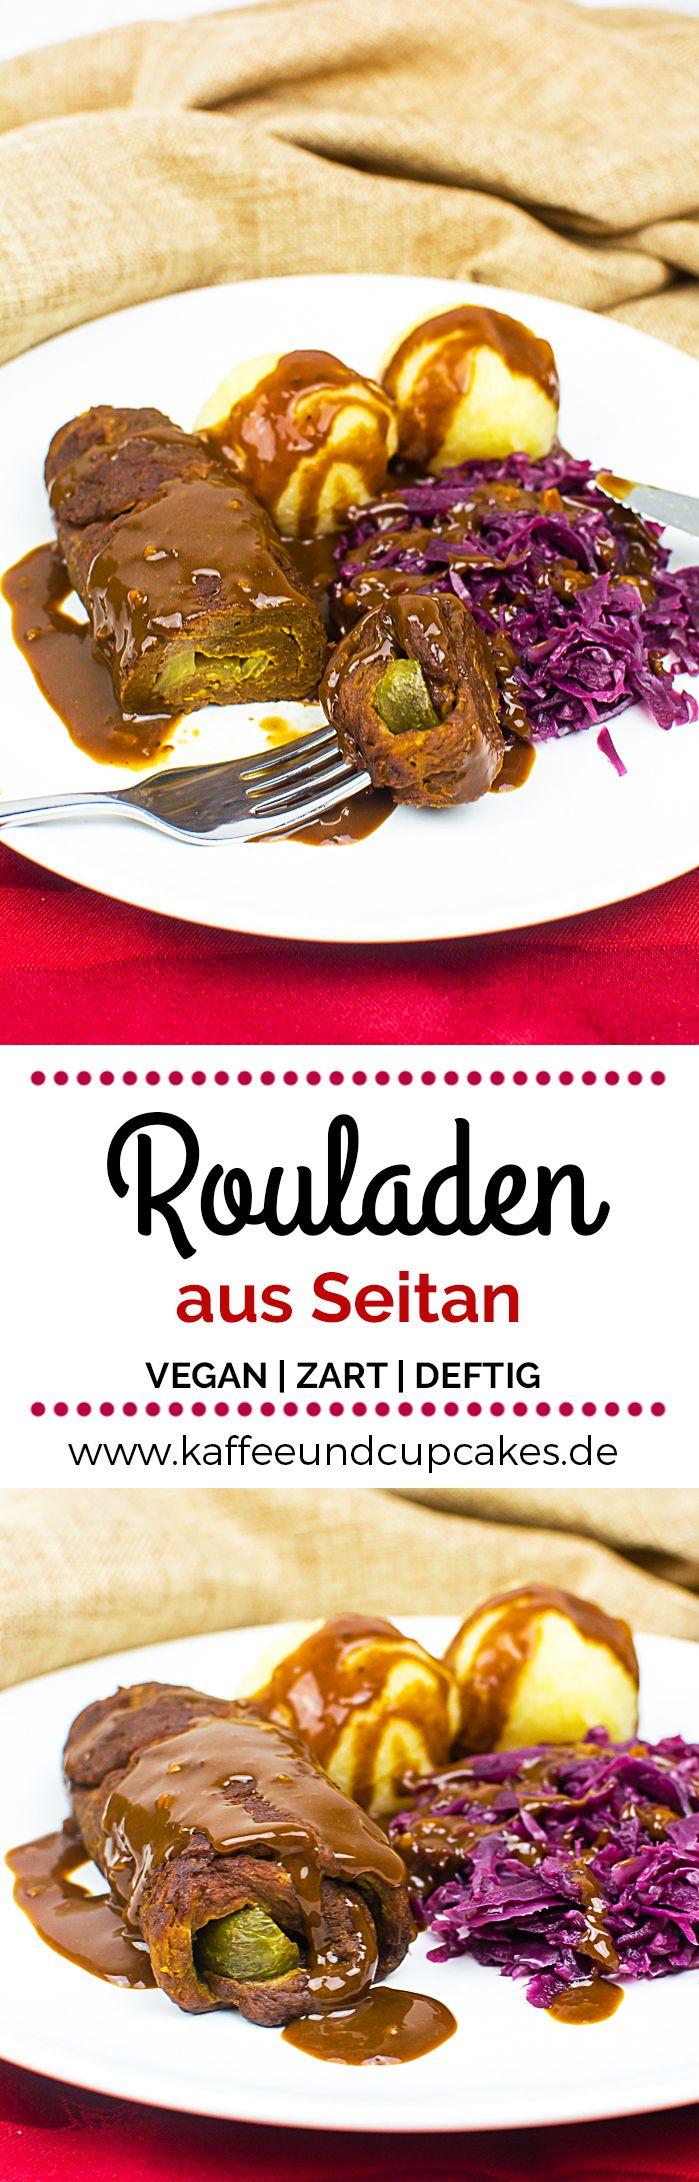 Zarte vegane Rouladen aus Seitan #finecooking